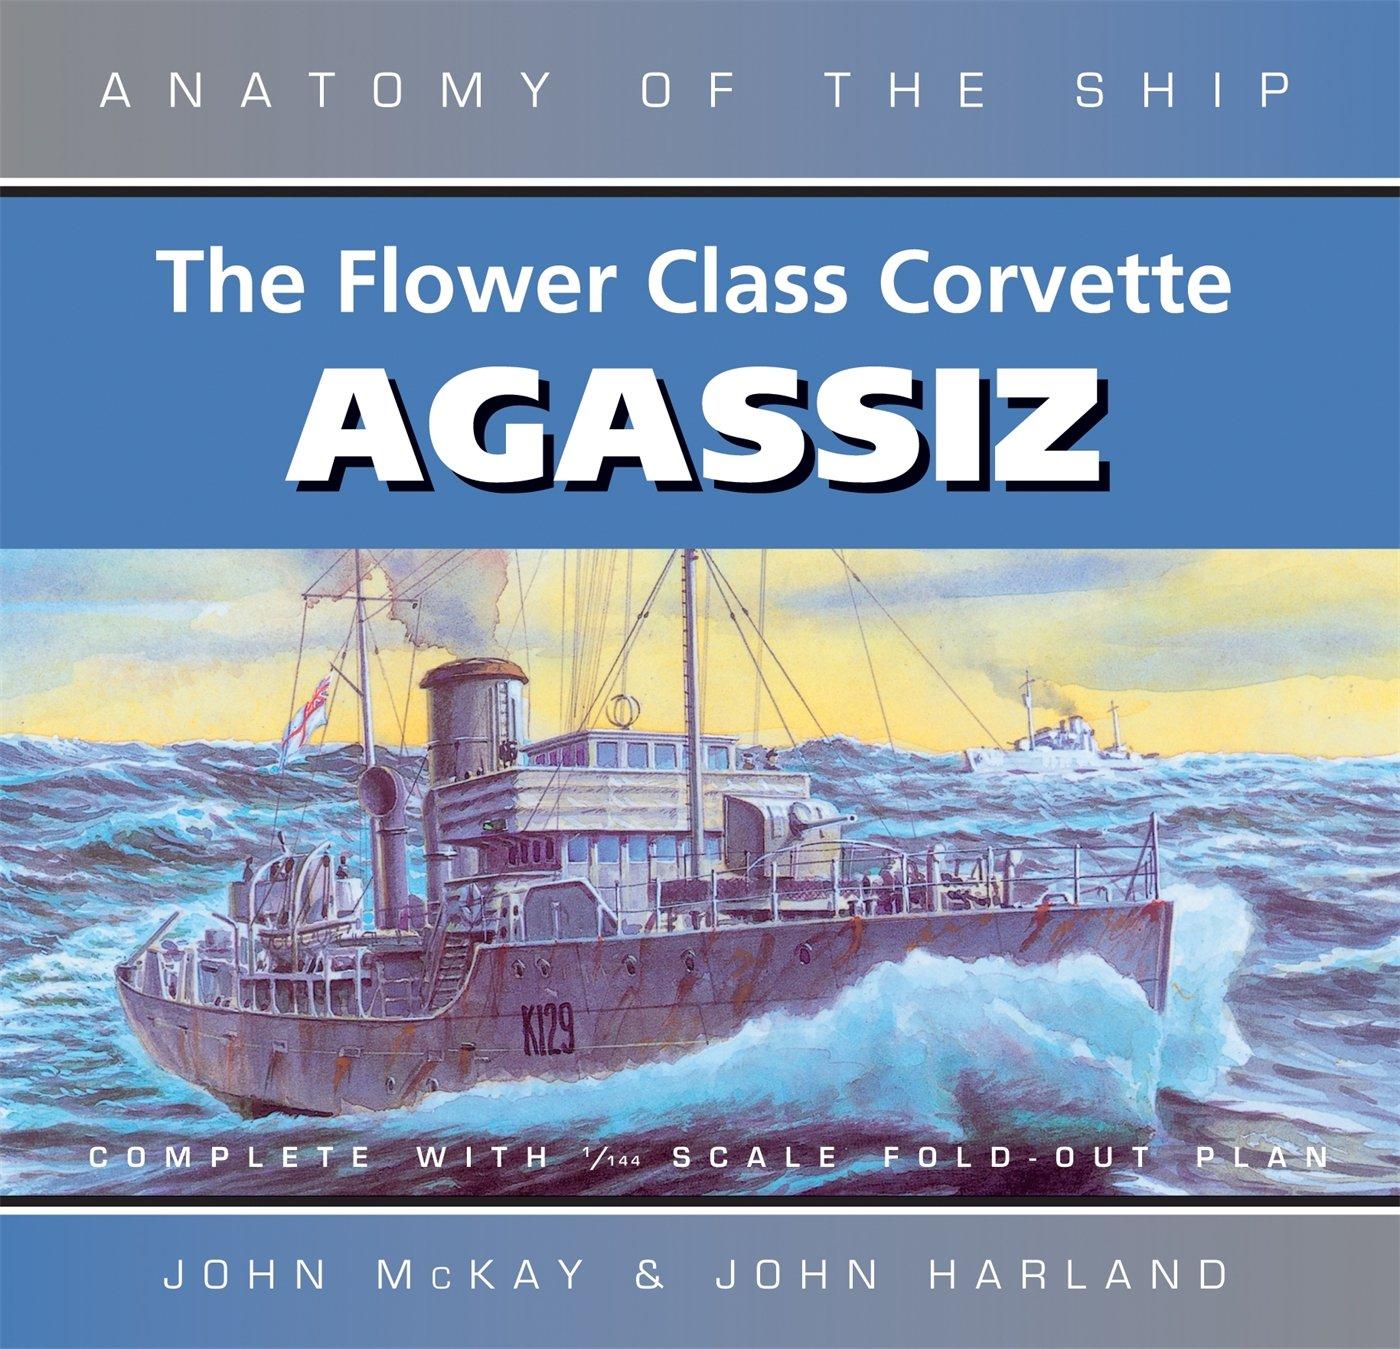 The Flower Class Corvette Agassiz Anatomy Of The Ship John Mckay